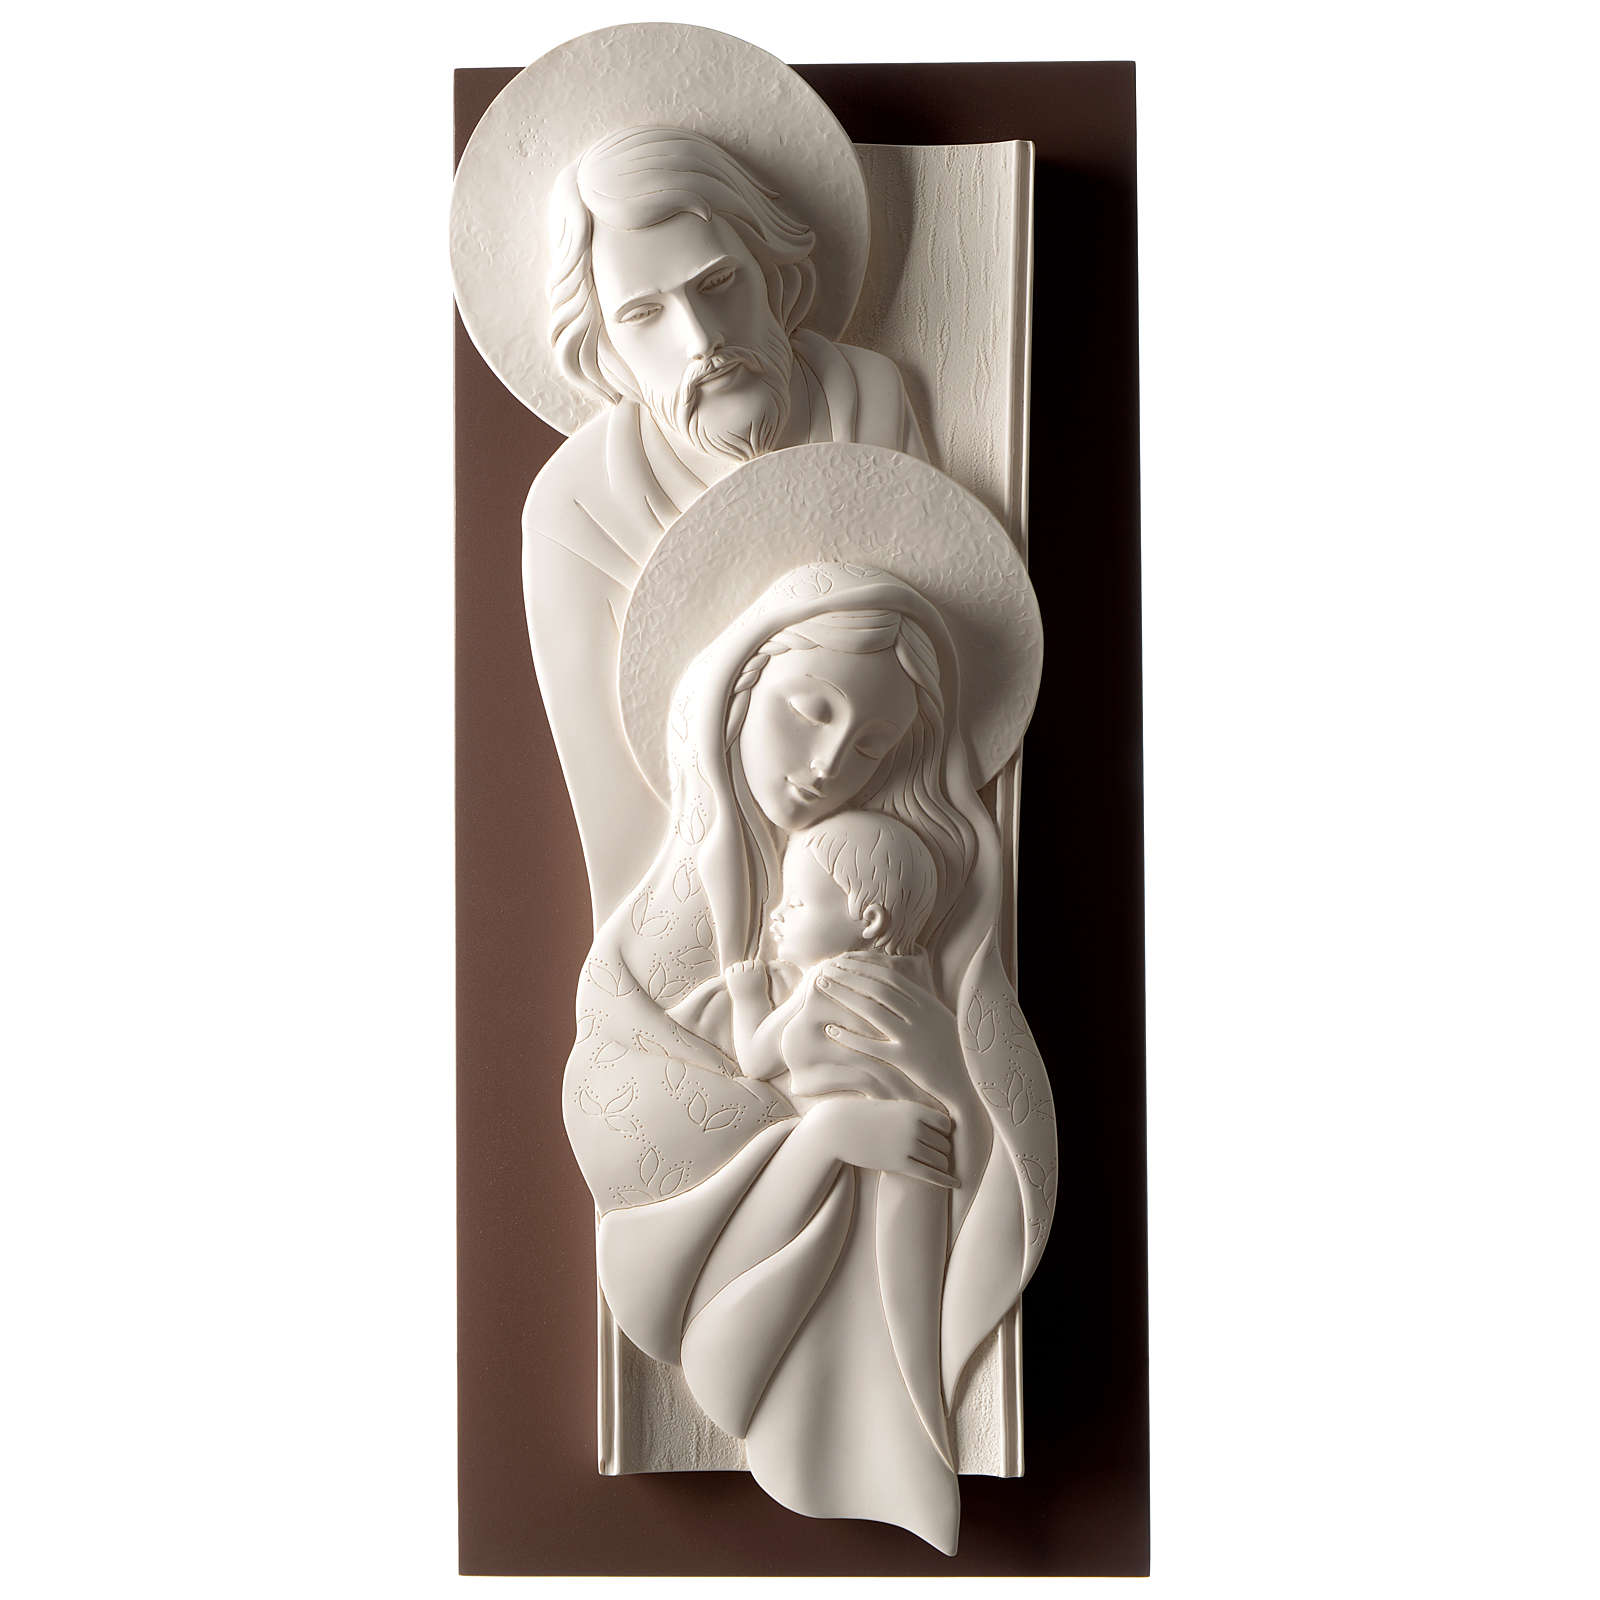 Cuadro Sagrada Familia vertical resina y madera 3